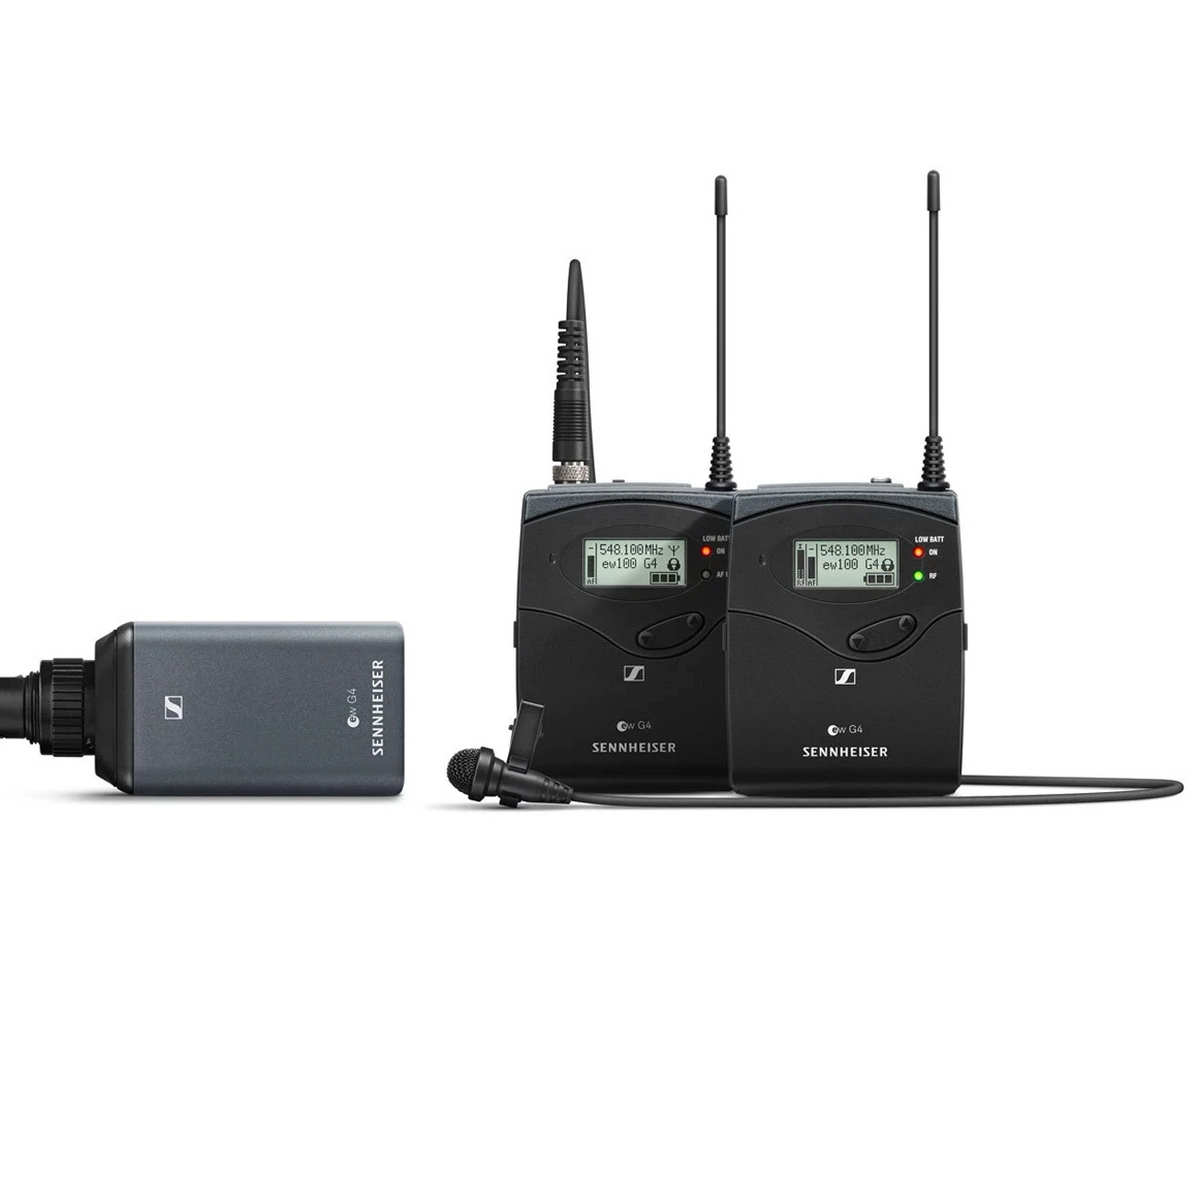 Sennheiser EW 100 ENG G4-E X Mikrofon Set